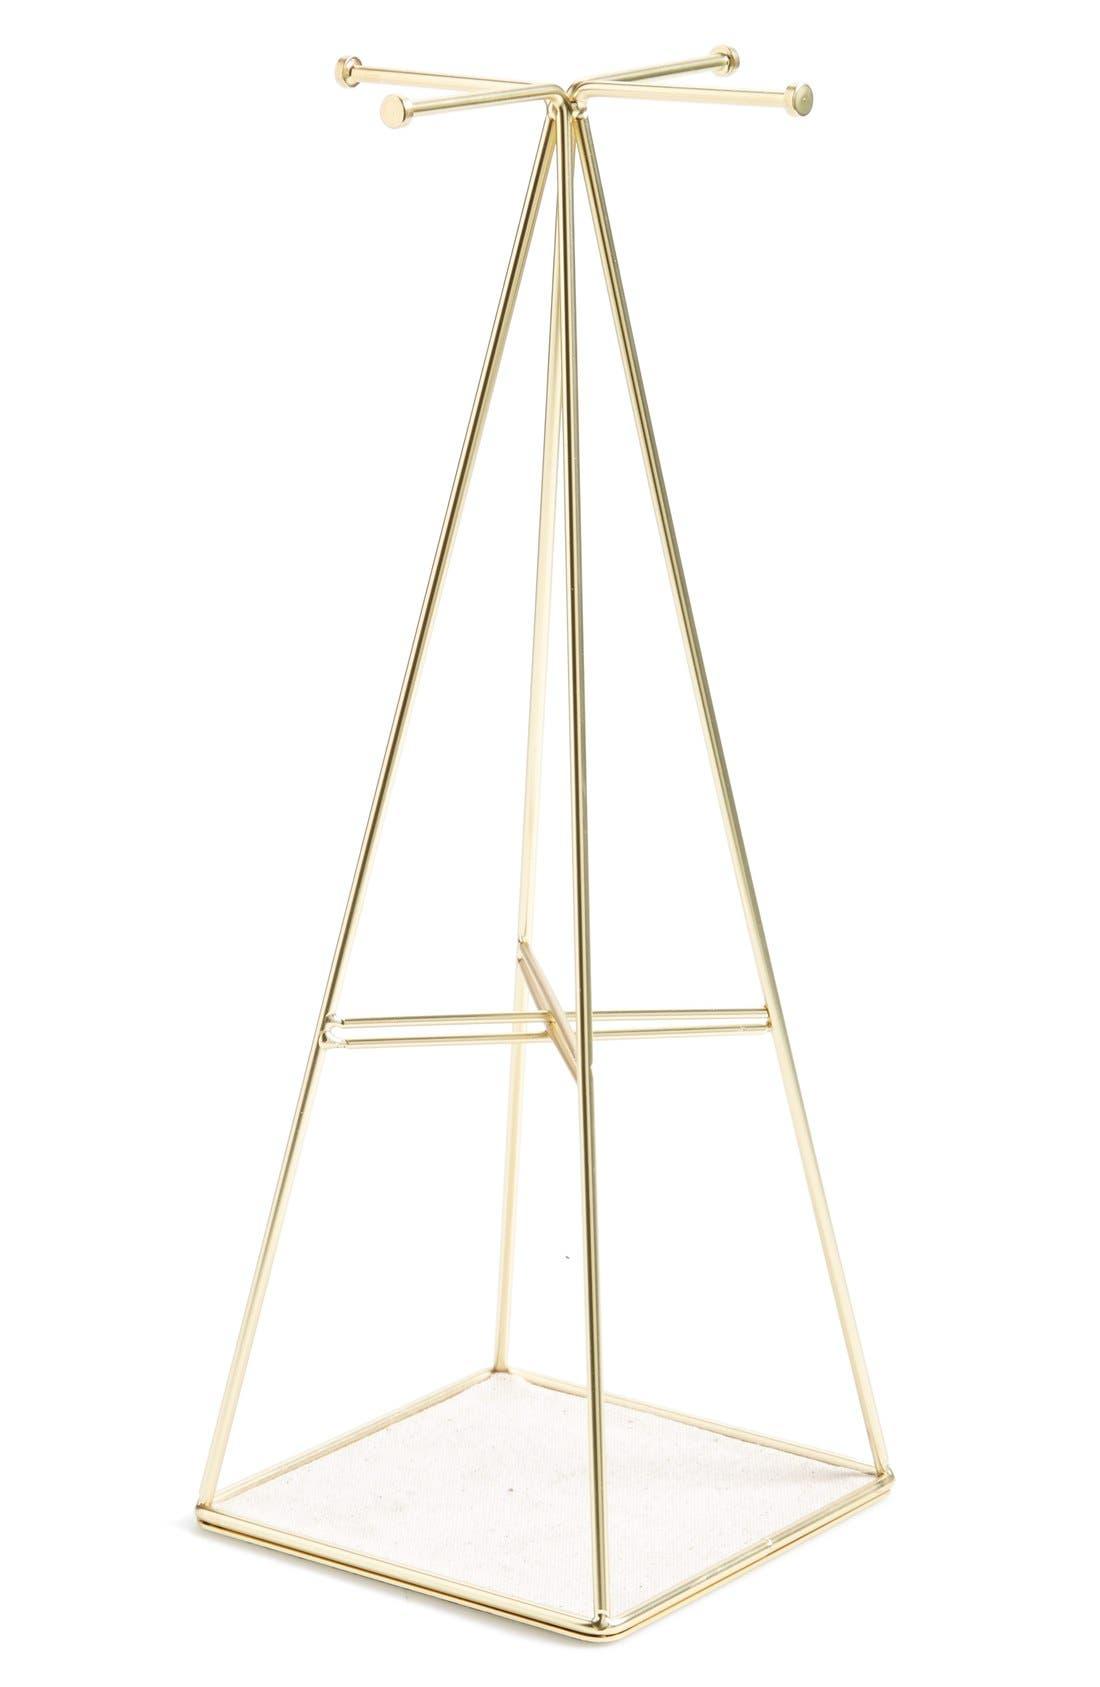 Alternate Image 1 Selected - Umbra 'Prisma' Jewelry Stand